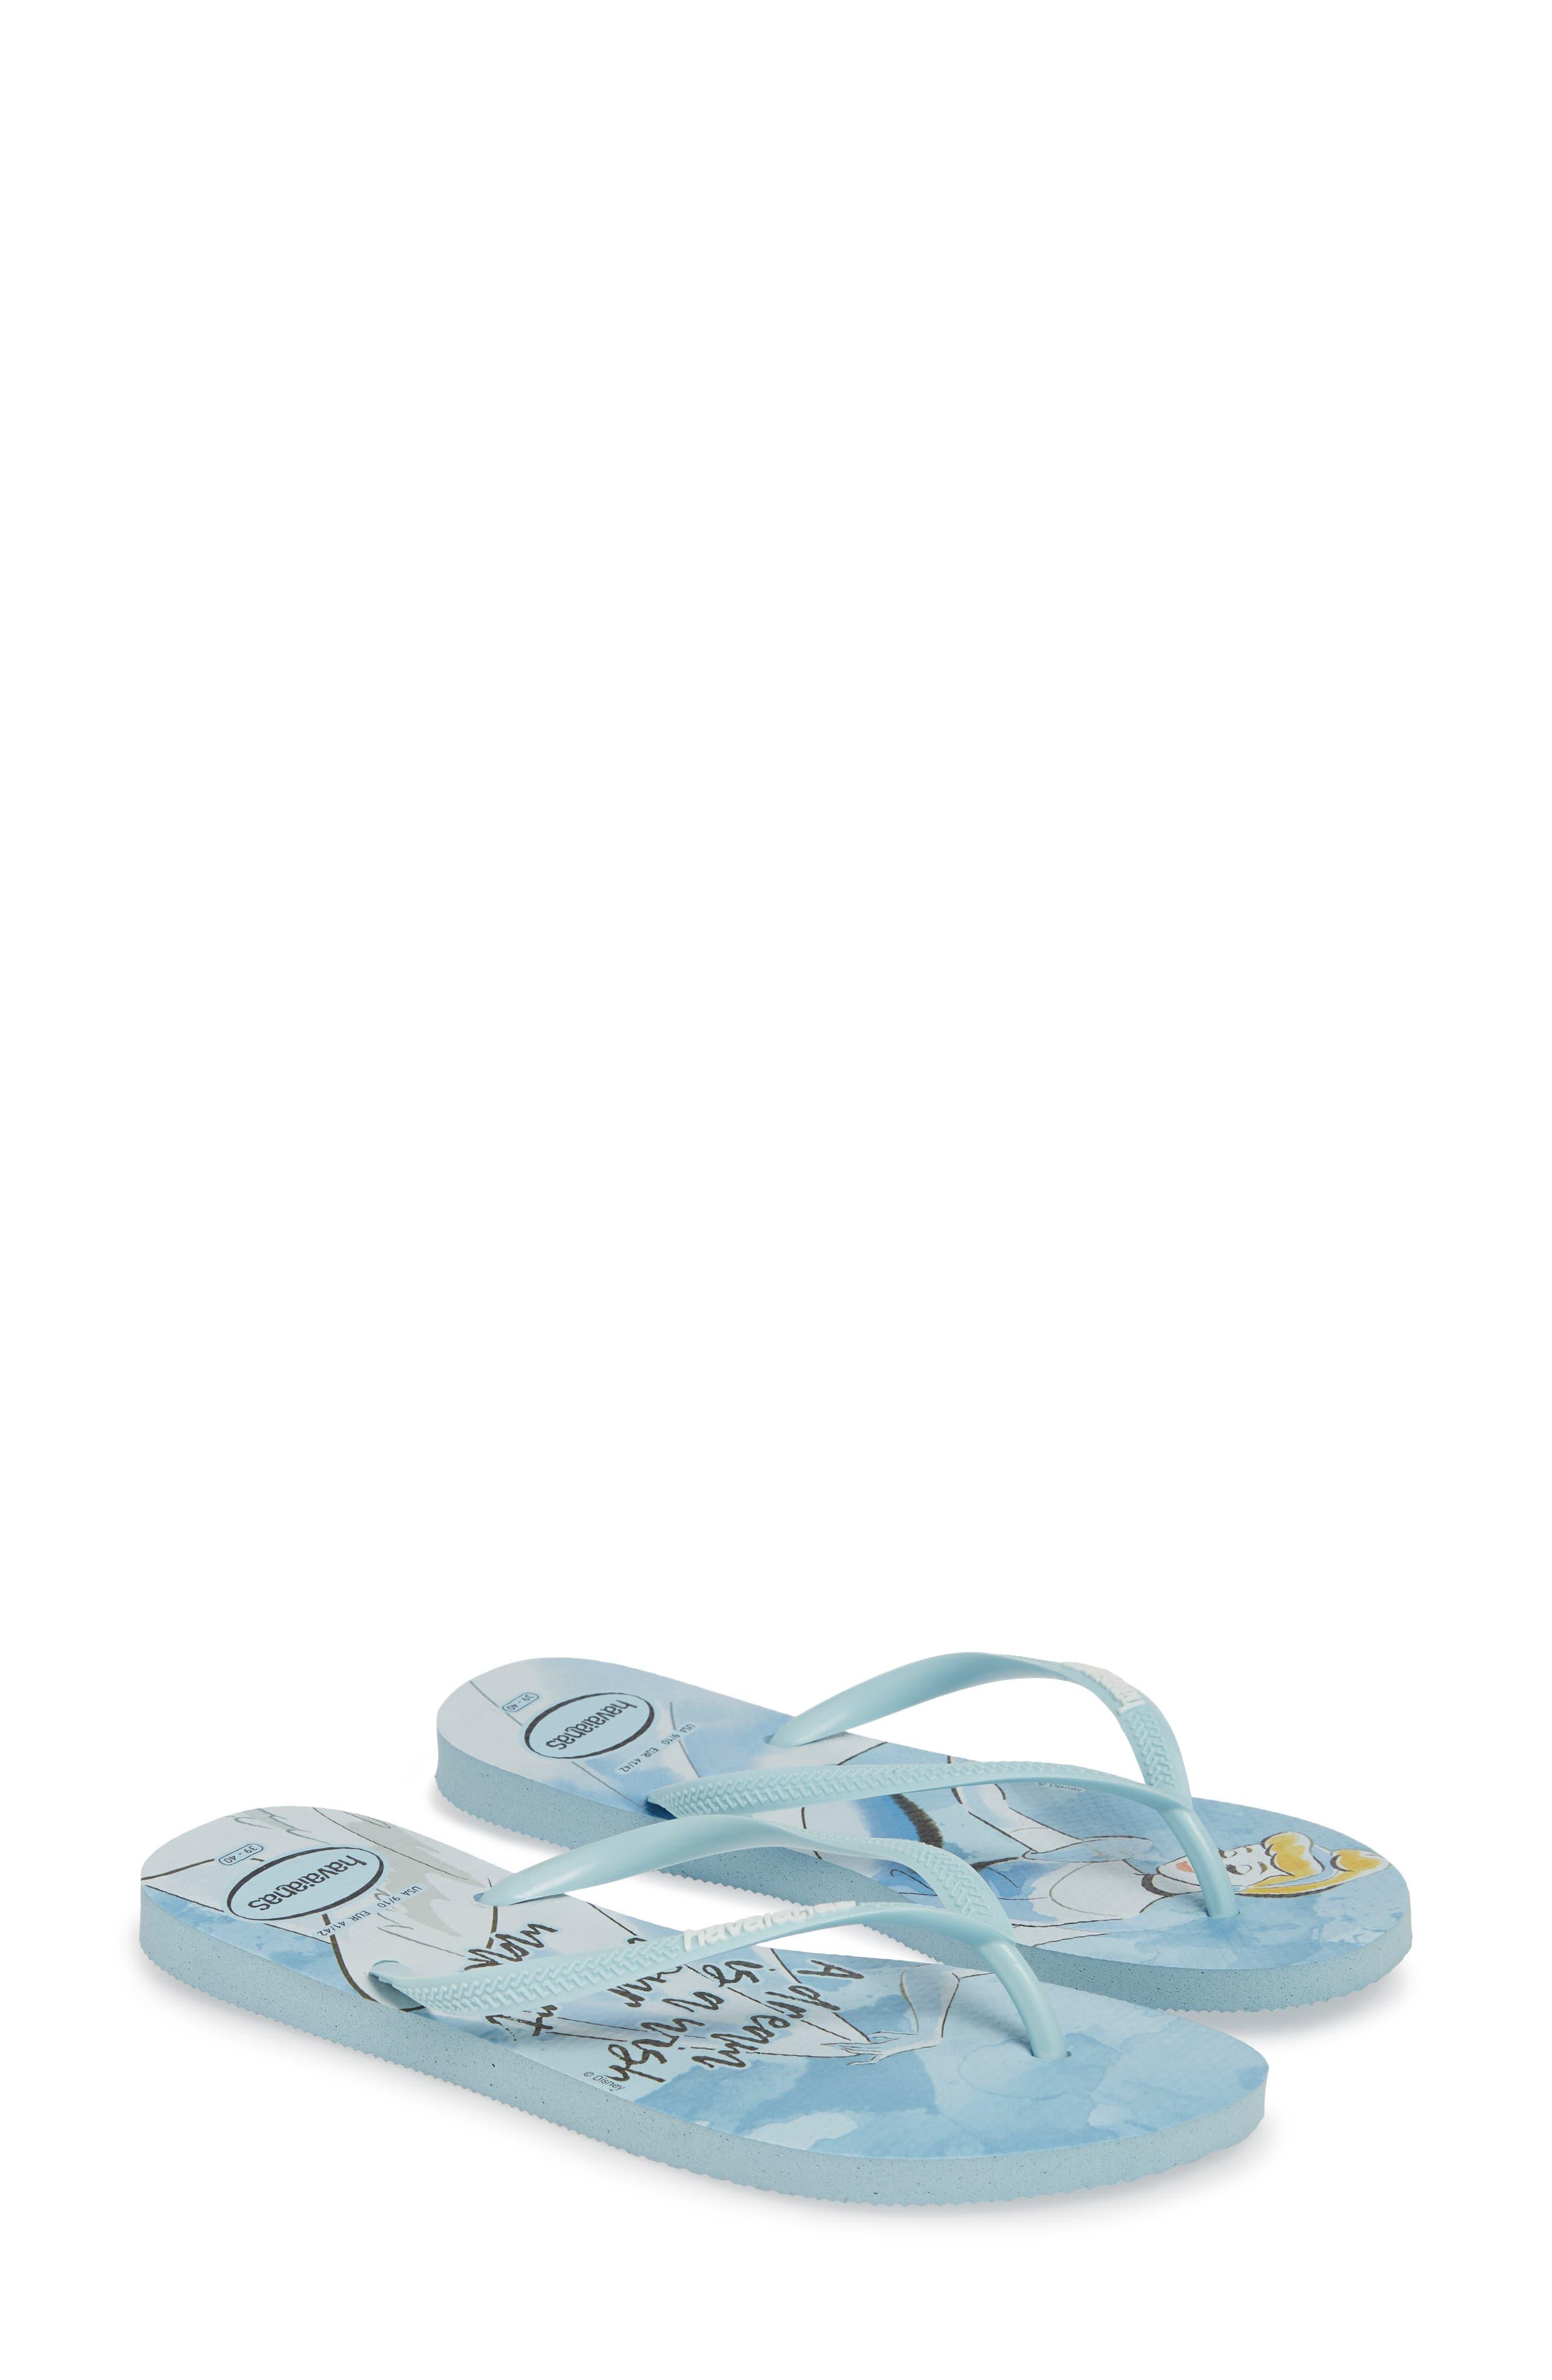 Havaiana Slim - Disney Princess Flip Flop,                             Alternate thumbnail 2, color,                             BLUE AQUA